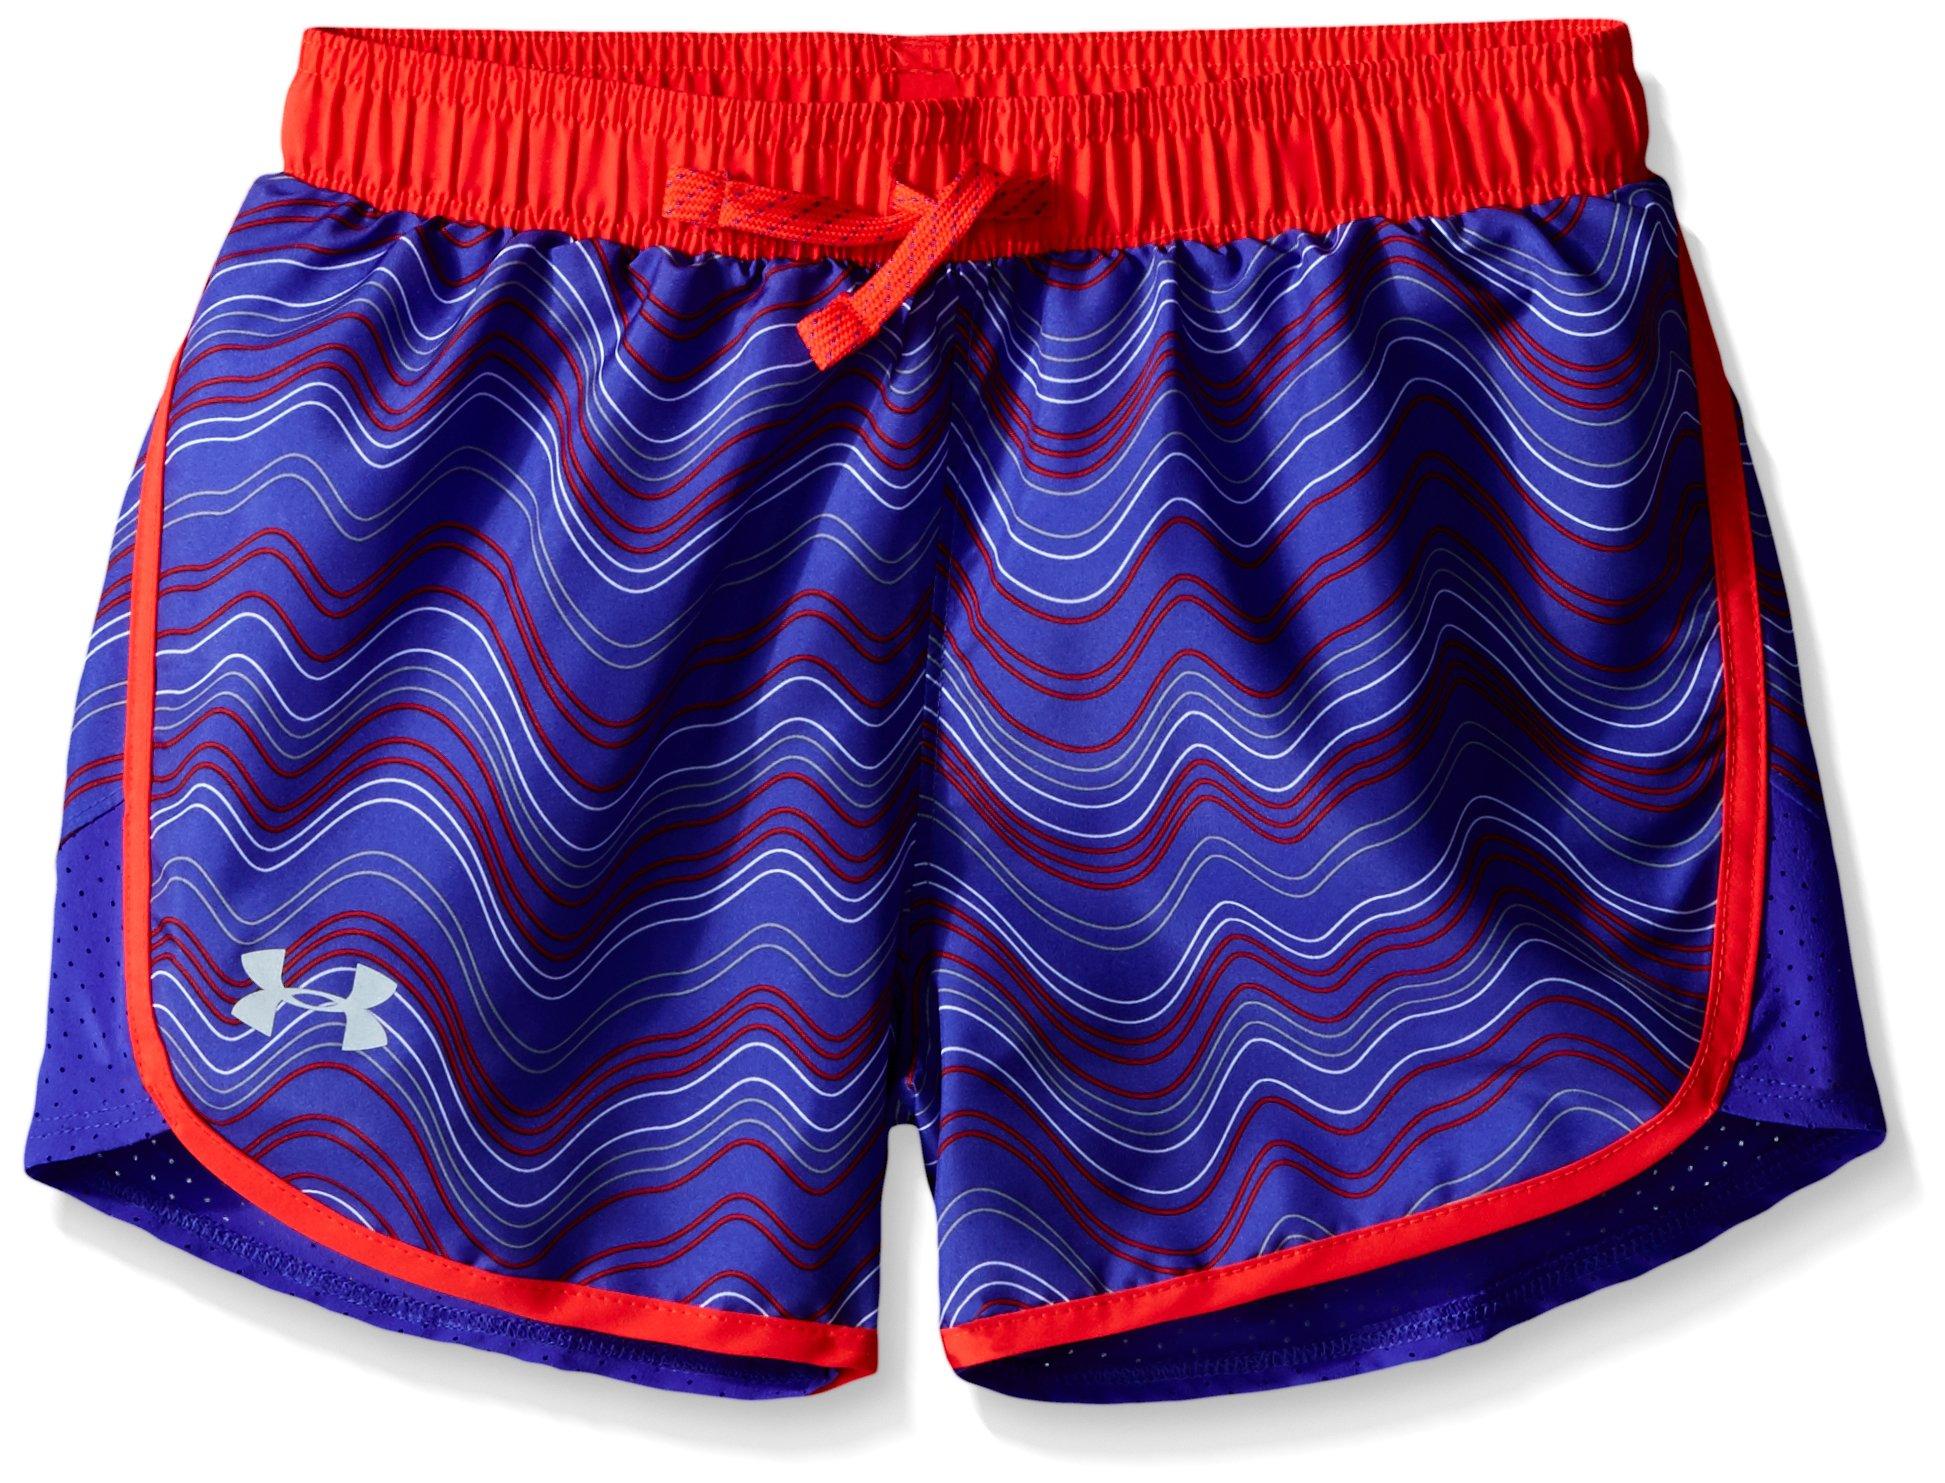 Under Armour Girls' Fast Lane Novelty Shorts, Constellation Purple /Reflective, Youth X-Large